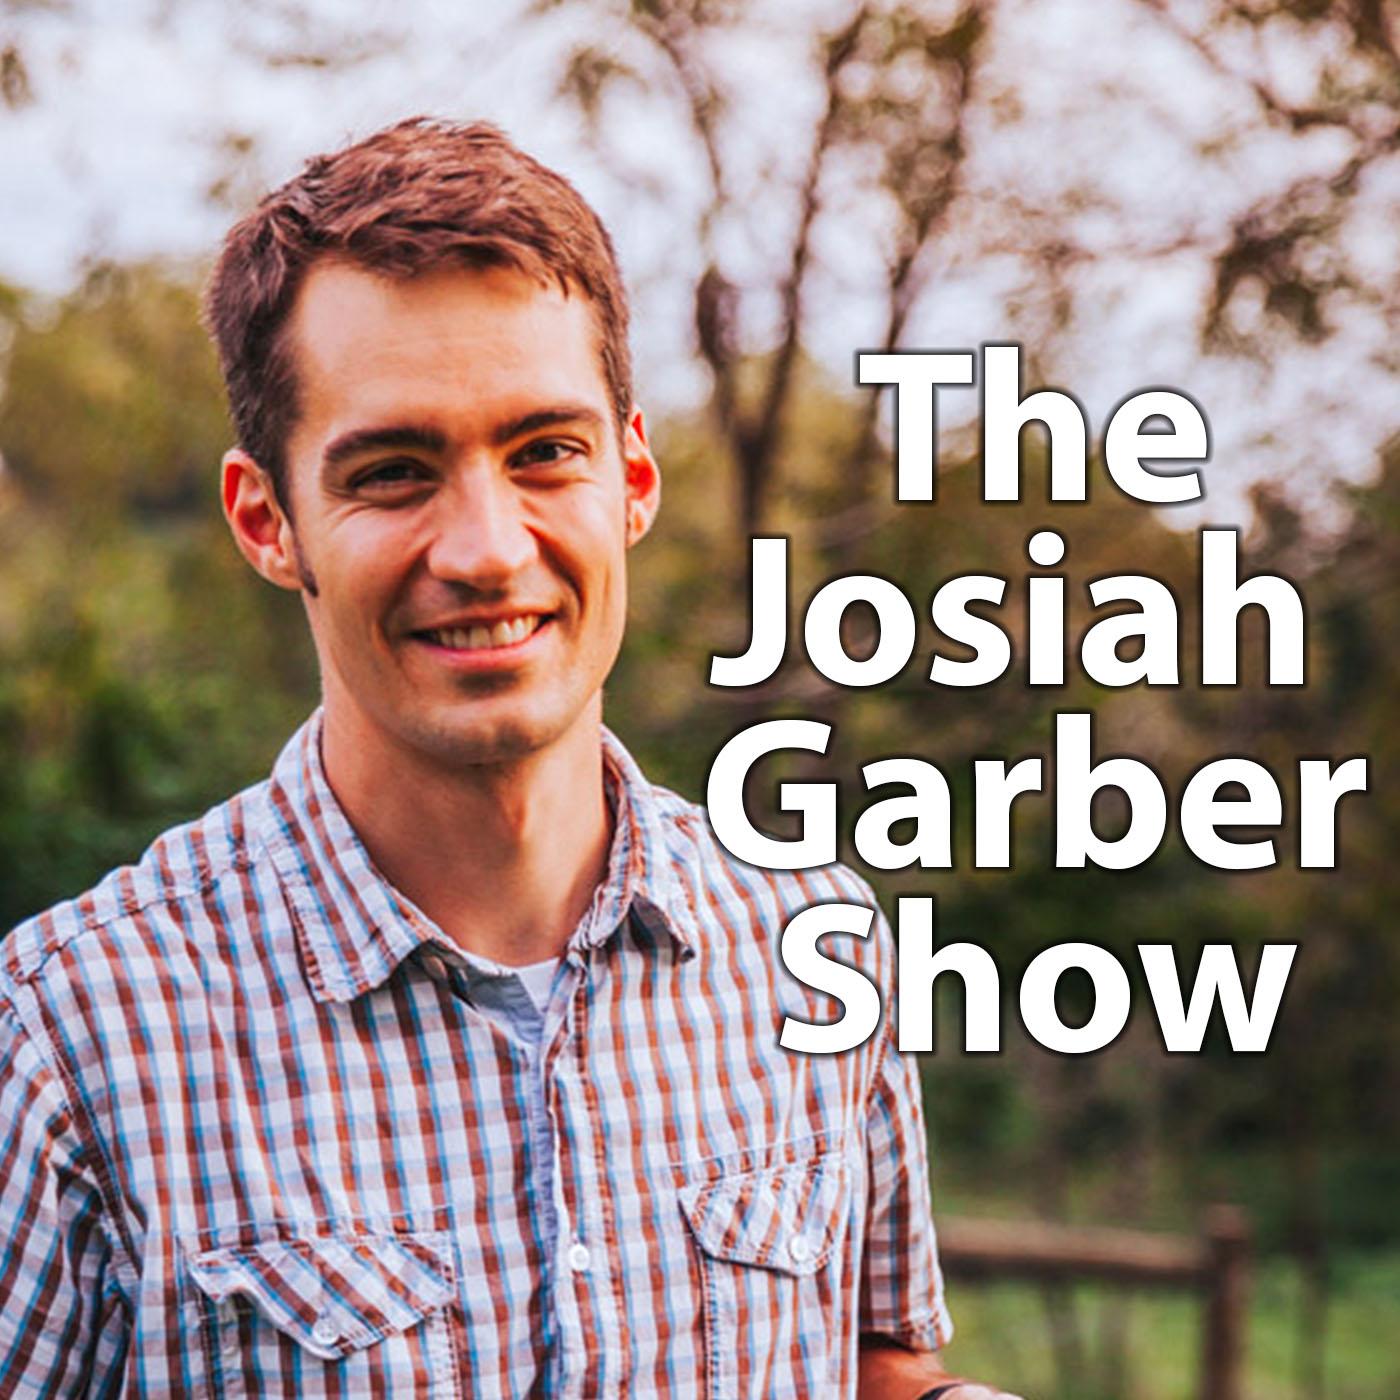 The Josiah Garber Show